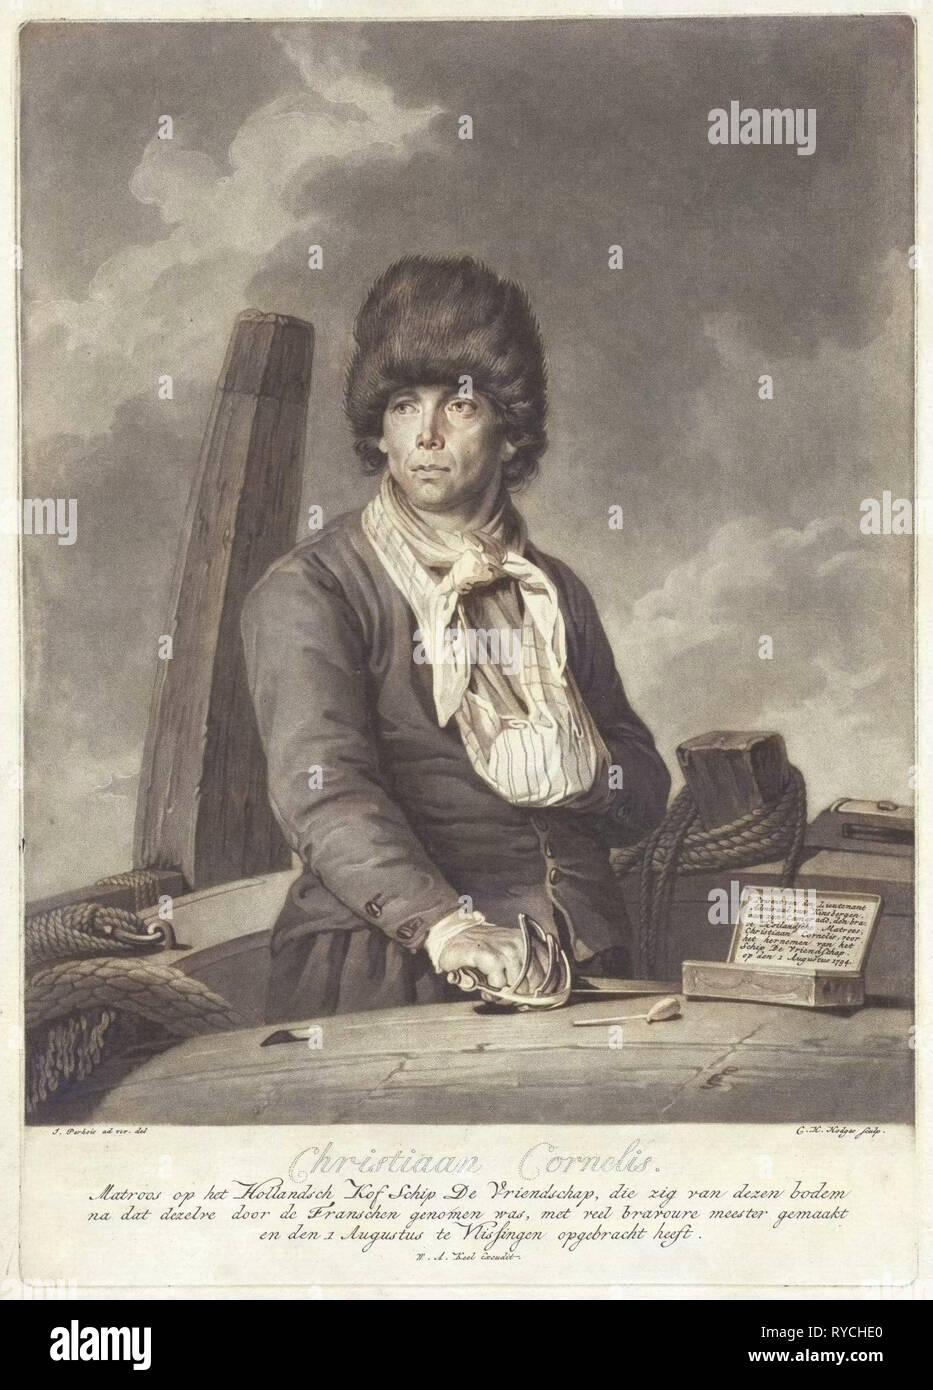 Portrait of Christiaan Cornelis, Charles Howard Hodges, William Alexander Keel, 1794-1796 - Stock Image